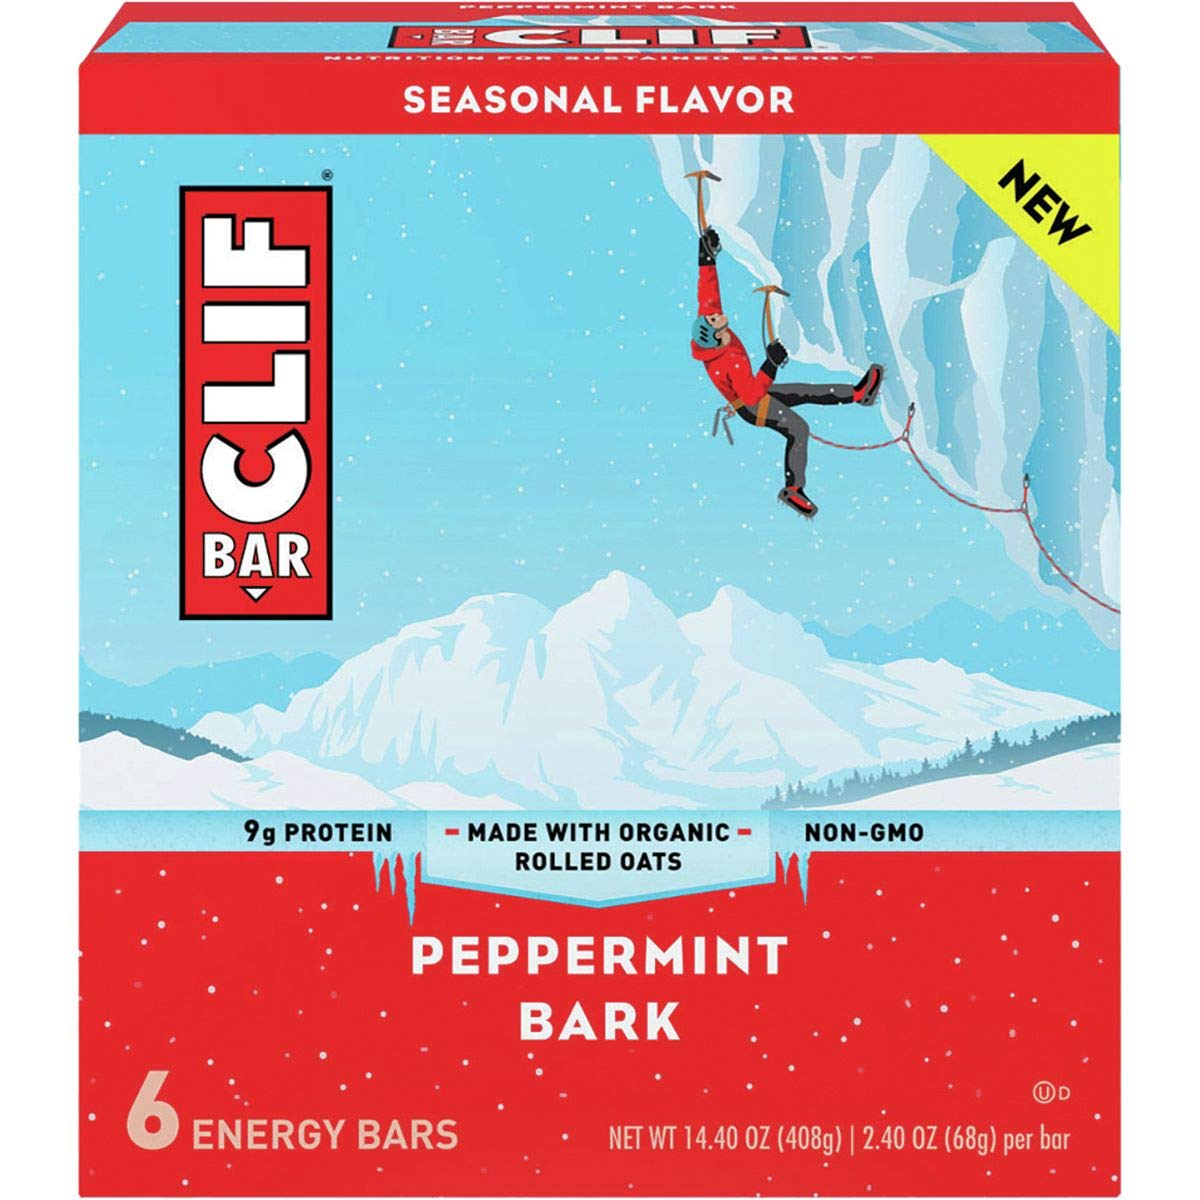 CLIF -Seasonal Energy Bar - Peppermint Bark - (2.4 oz, 12 Count) by Clif Bar